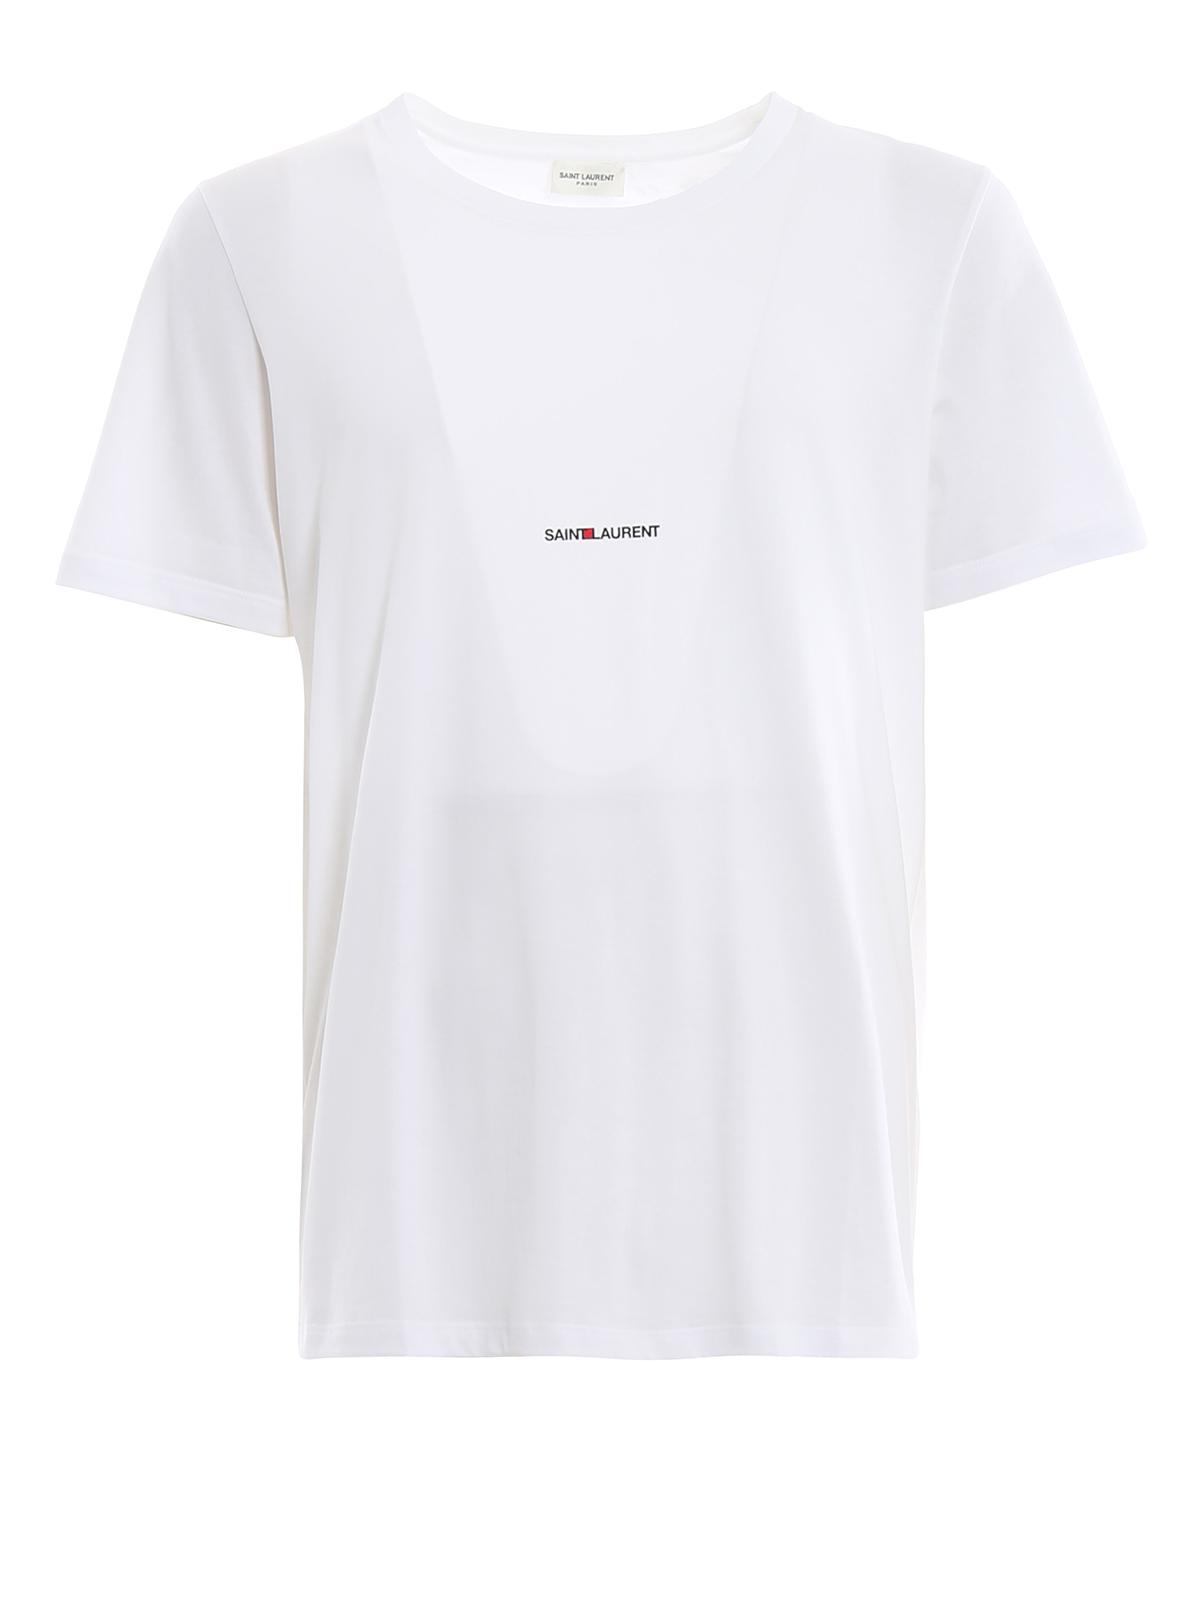 saint laurent cotton jersey logo white tee t shirts. Black Bedroom Furniture Sets. Home Design Ideas